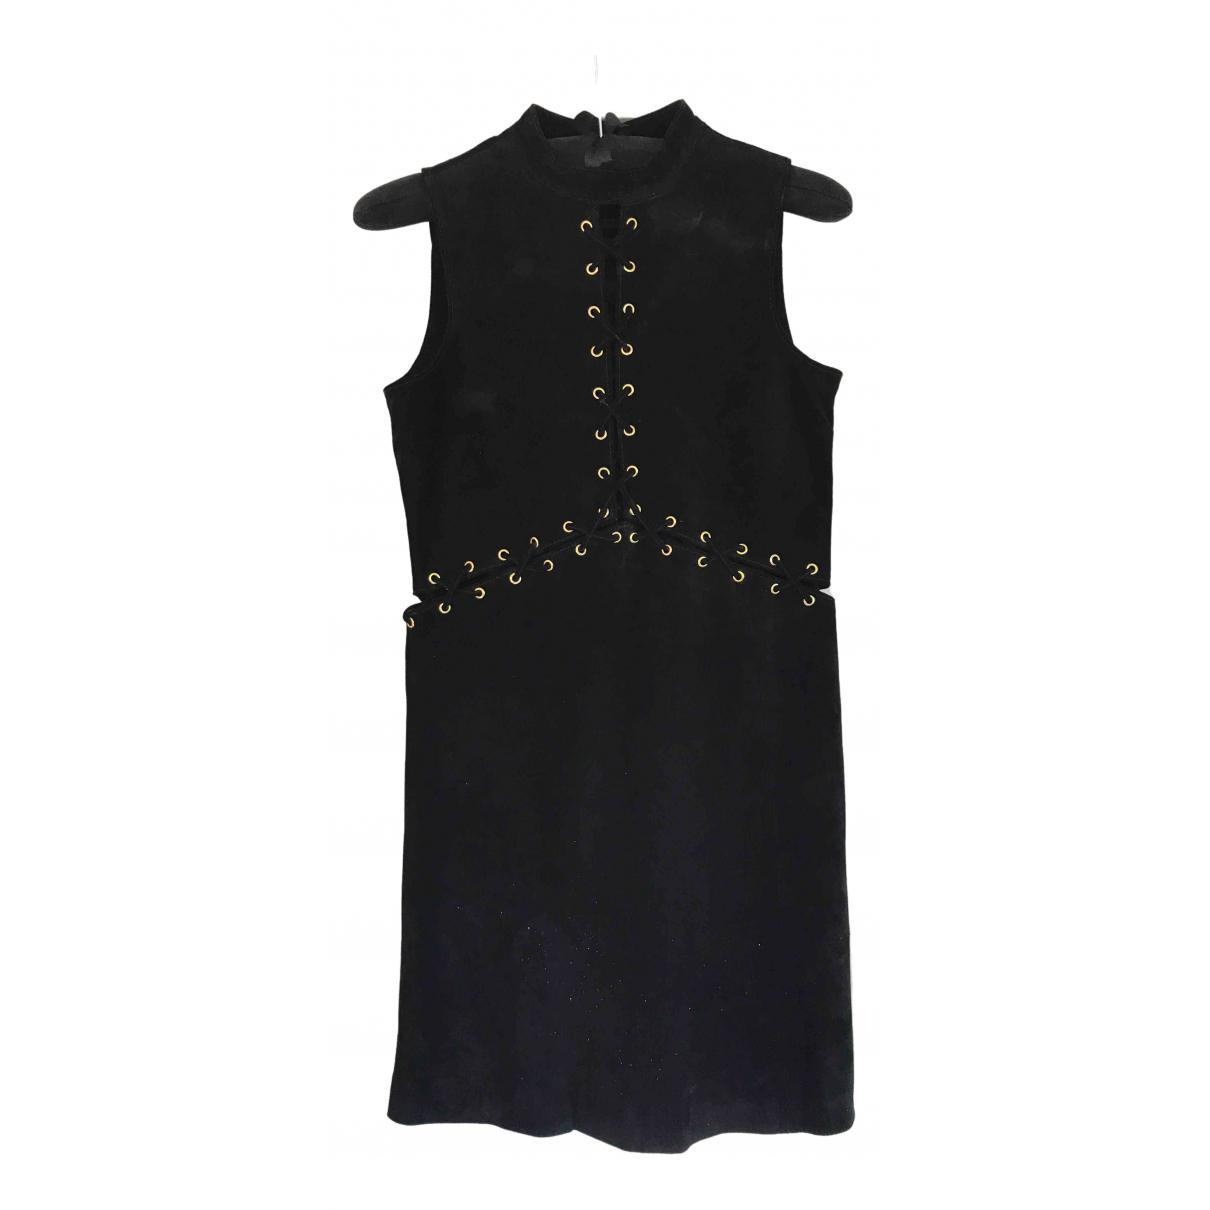 Asos \N Kleid in  Schwarz Veloursleder